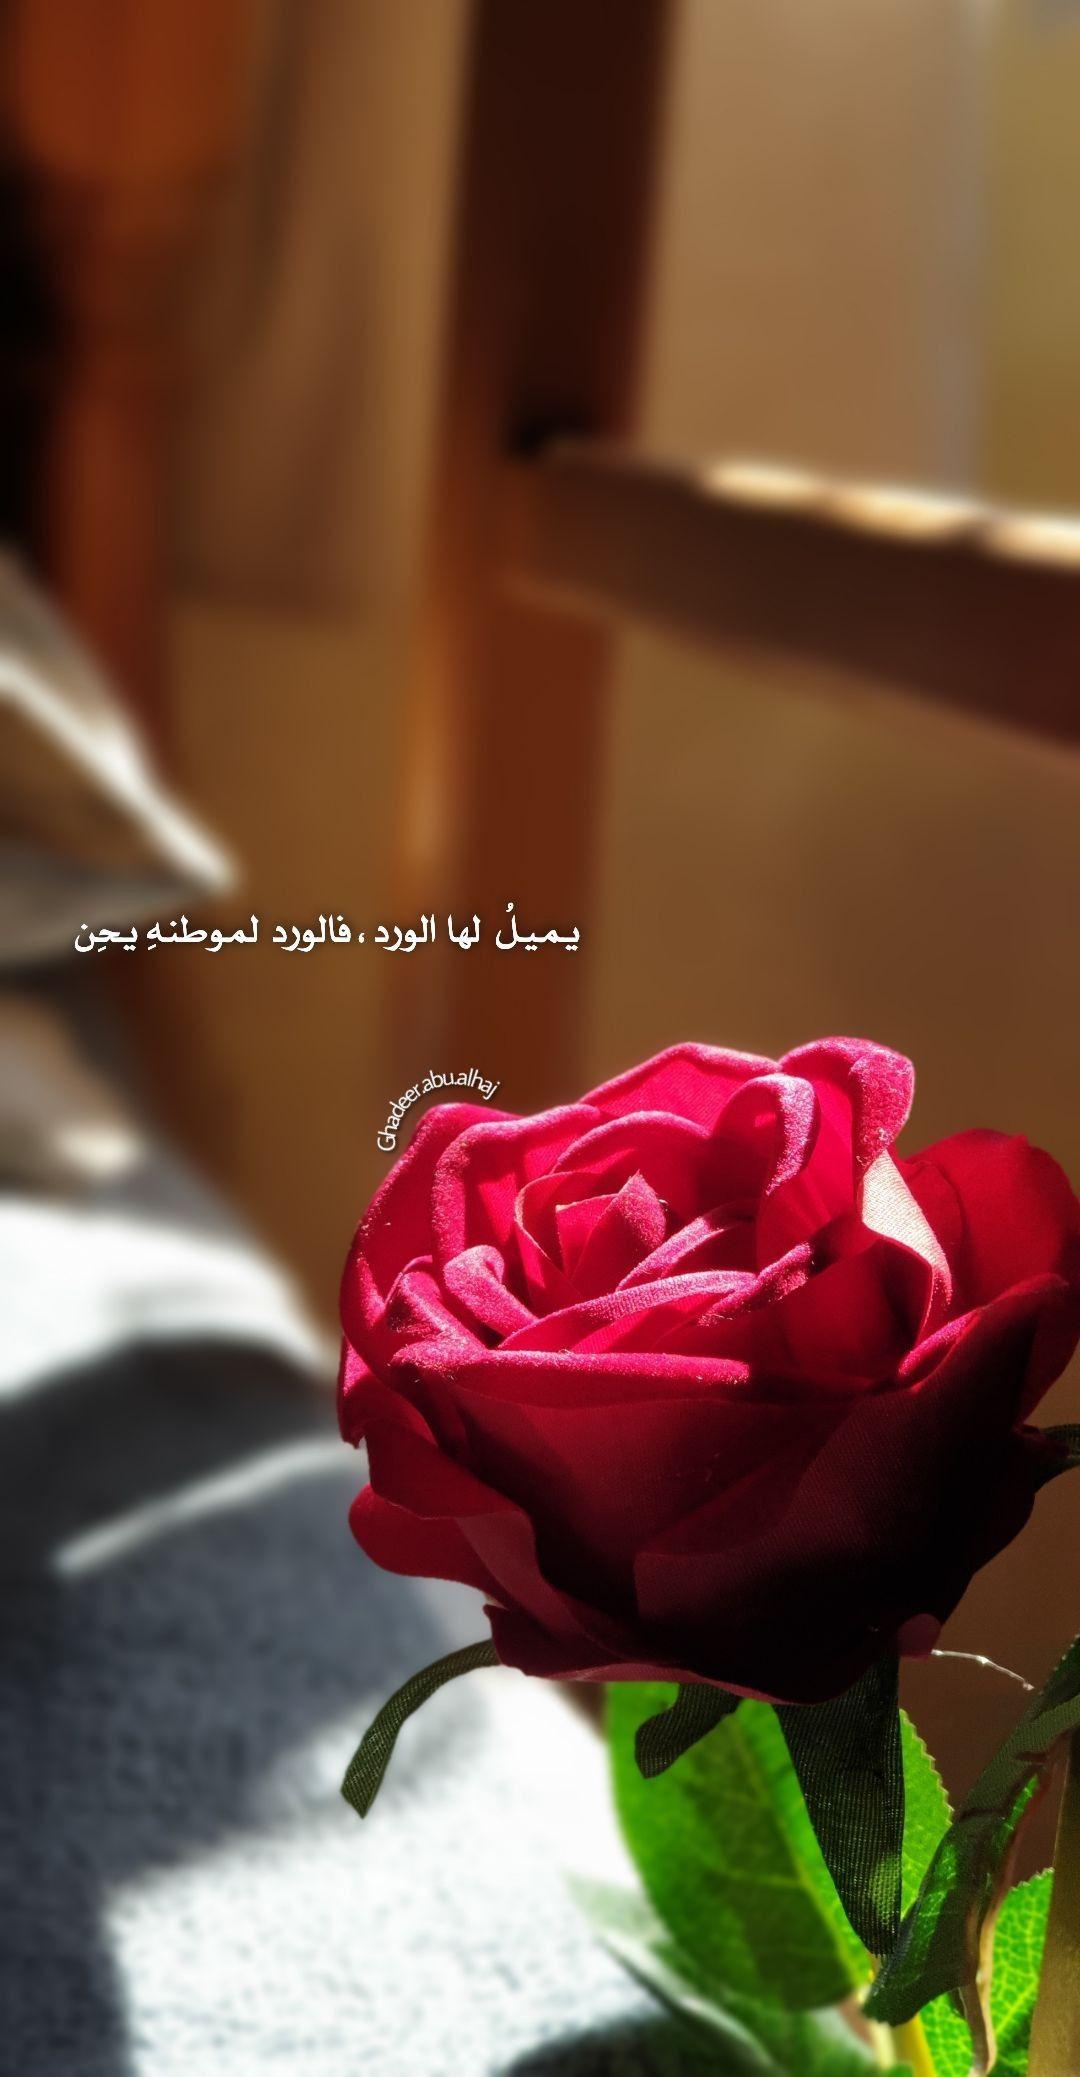 يميل لها الورد فالورد لموطنه يح ن Love Quotes Wallpaper Pink Wallpaper Iphone Book Clip Art